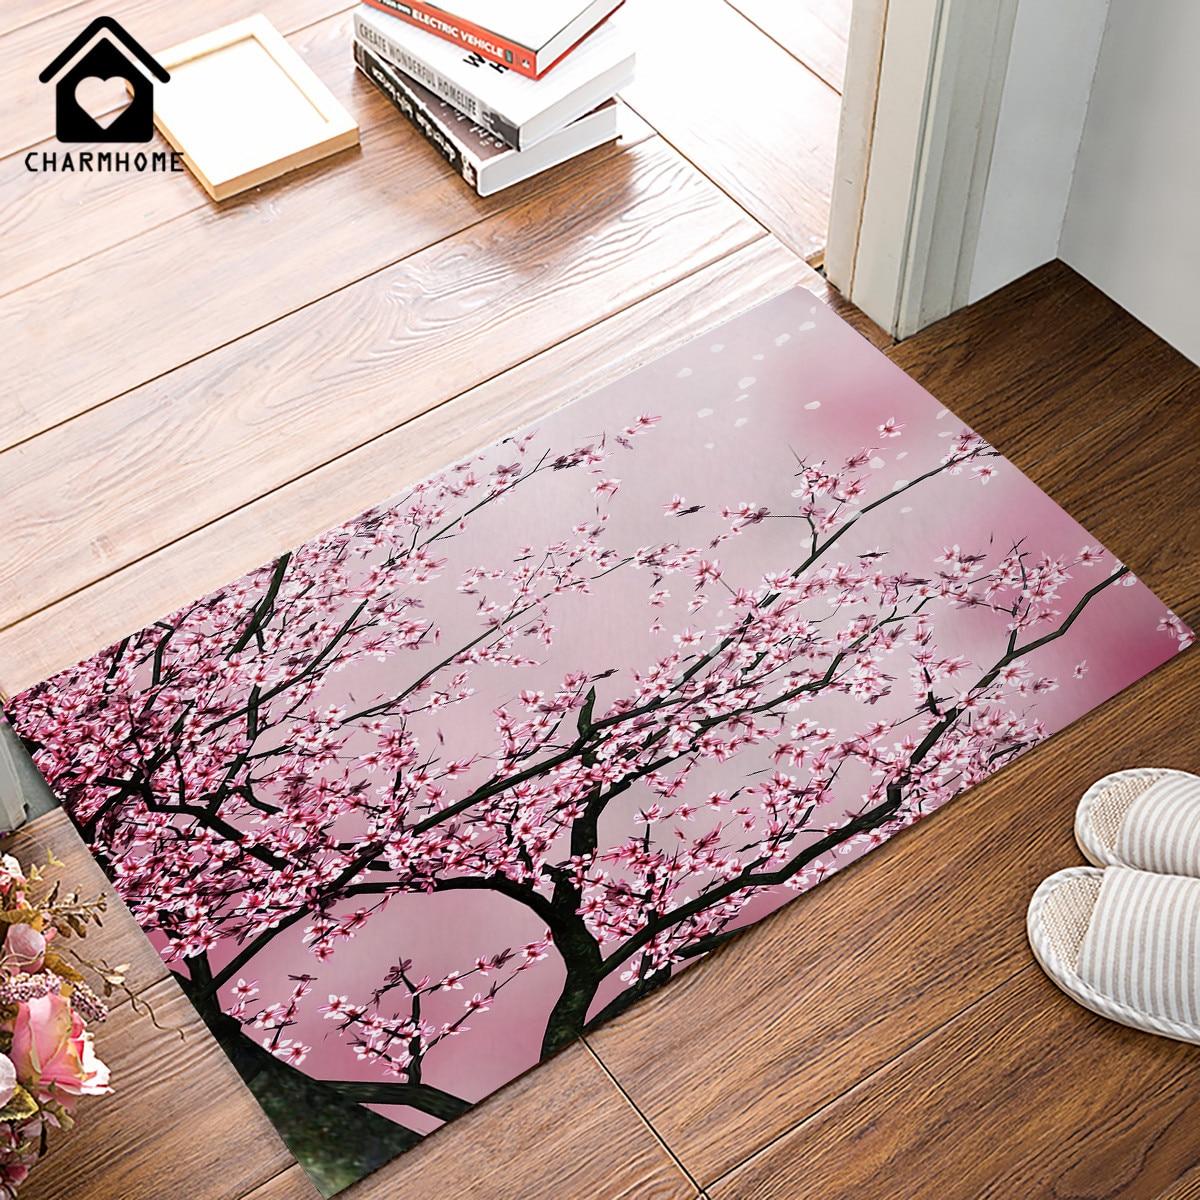 Carpets Door Mats Pink Cherry Blossom